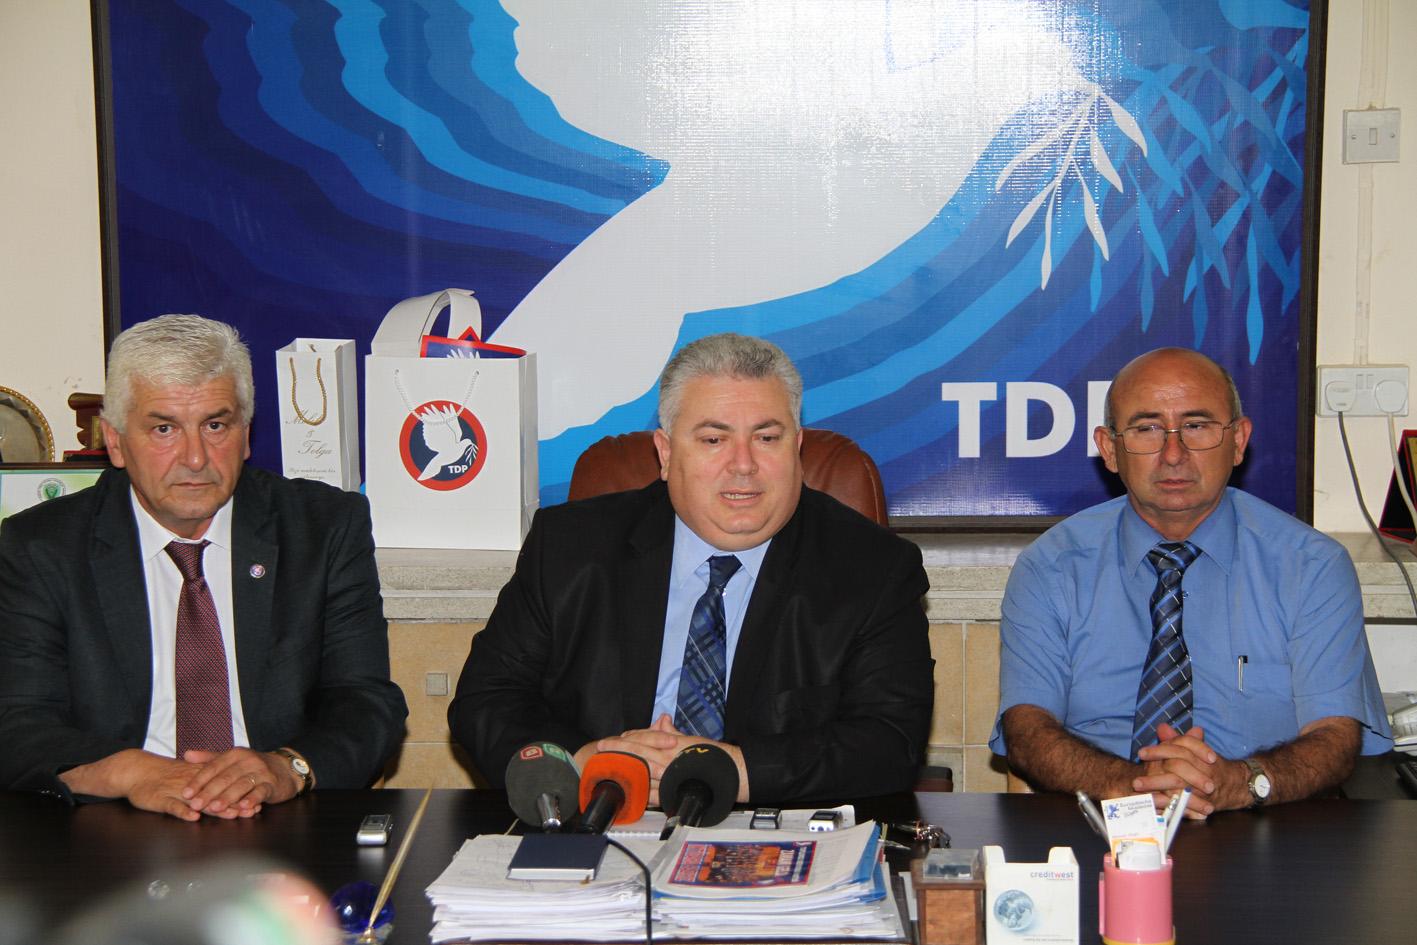 ARSLAN GENEL SEÇİMLERDE TDP'DEN MİLLETVEKİLİ ADAYI